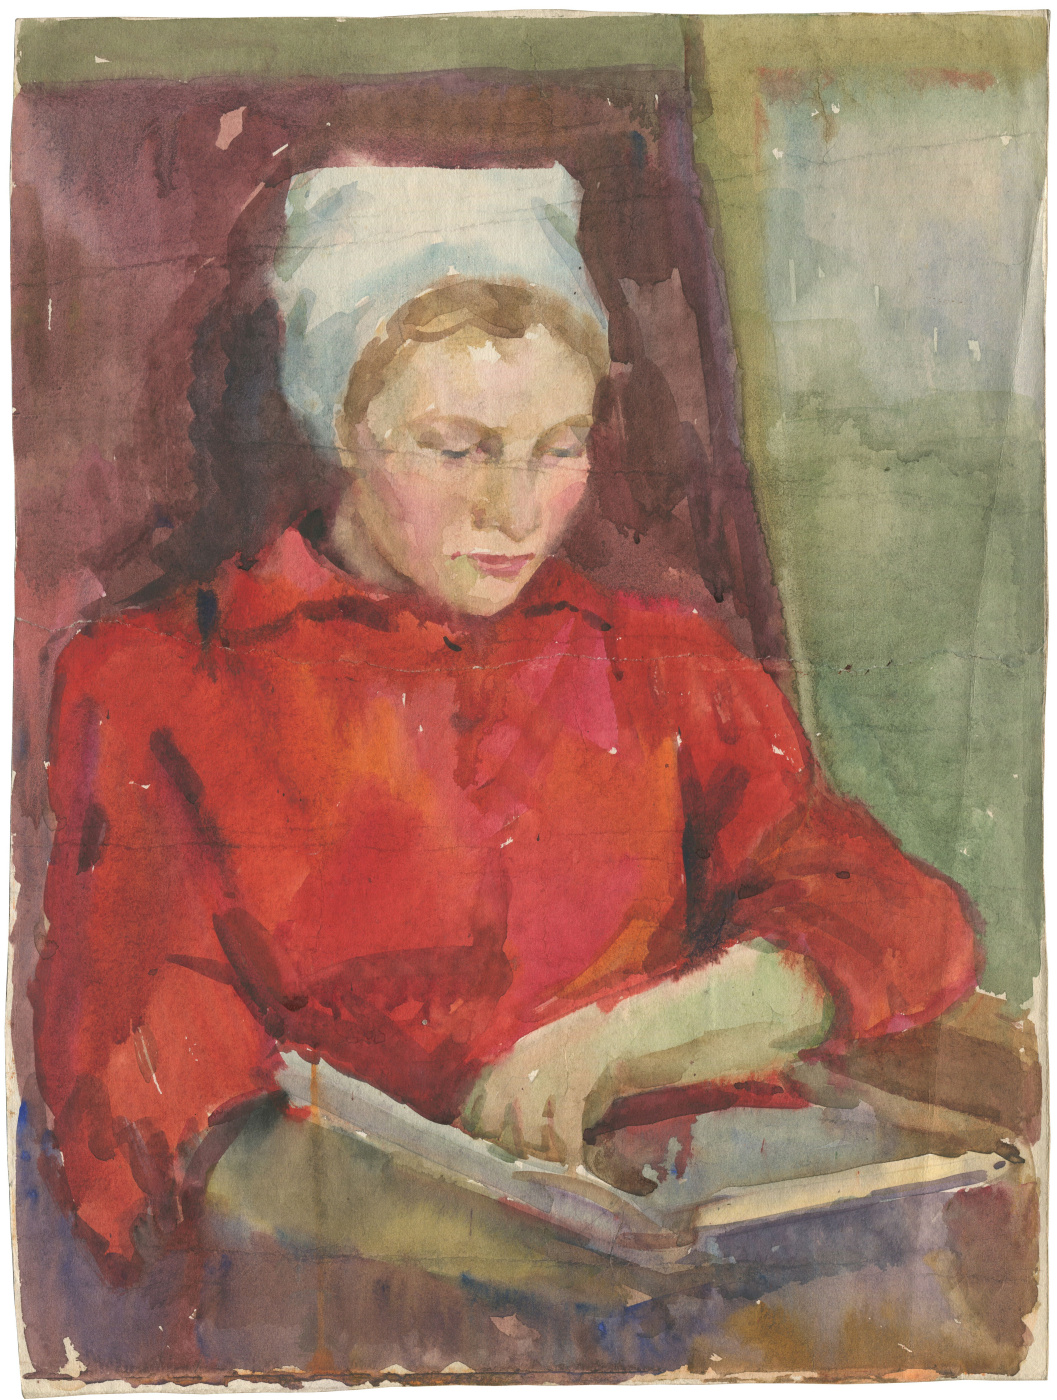 Alexandrovich Rudolf Pavlov. Woman with a book.